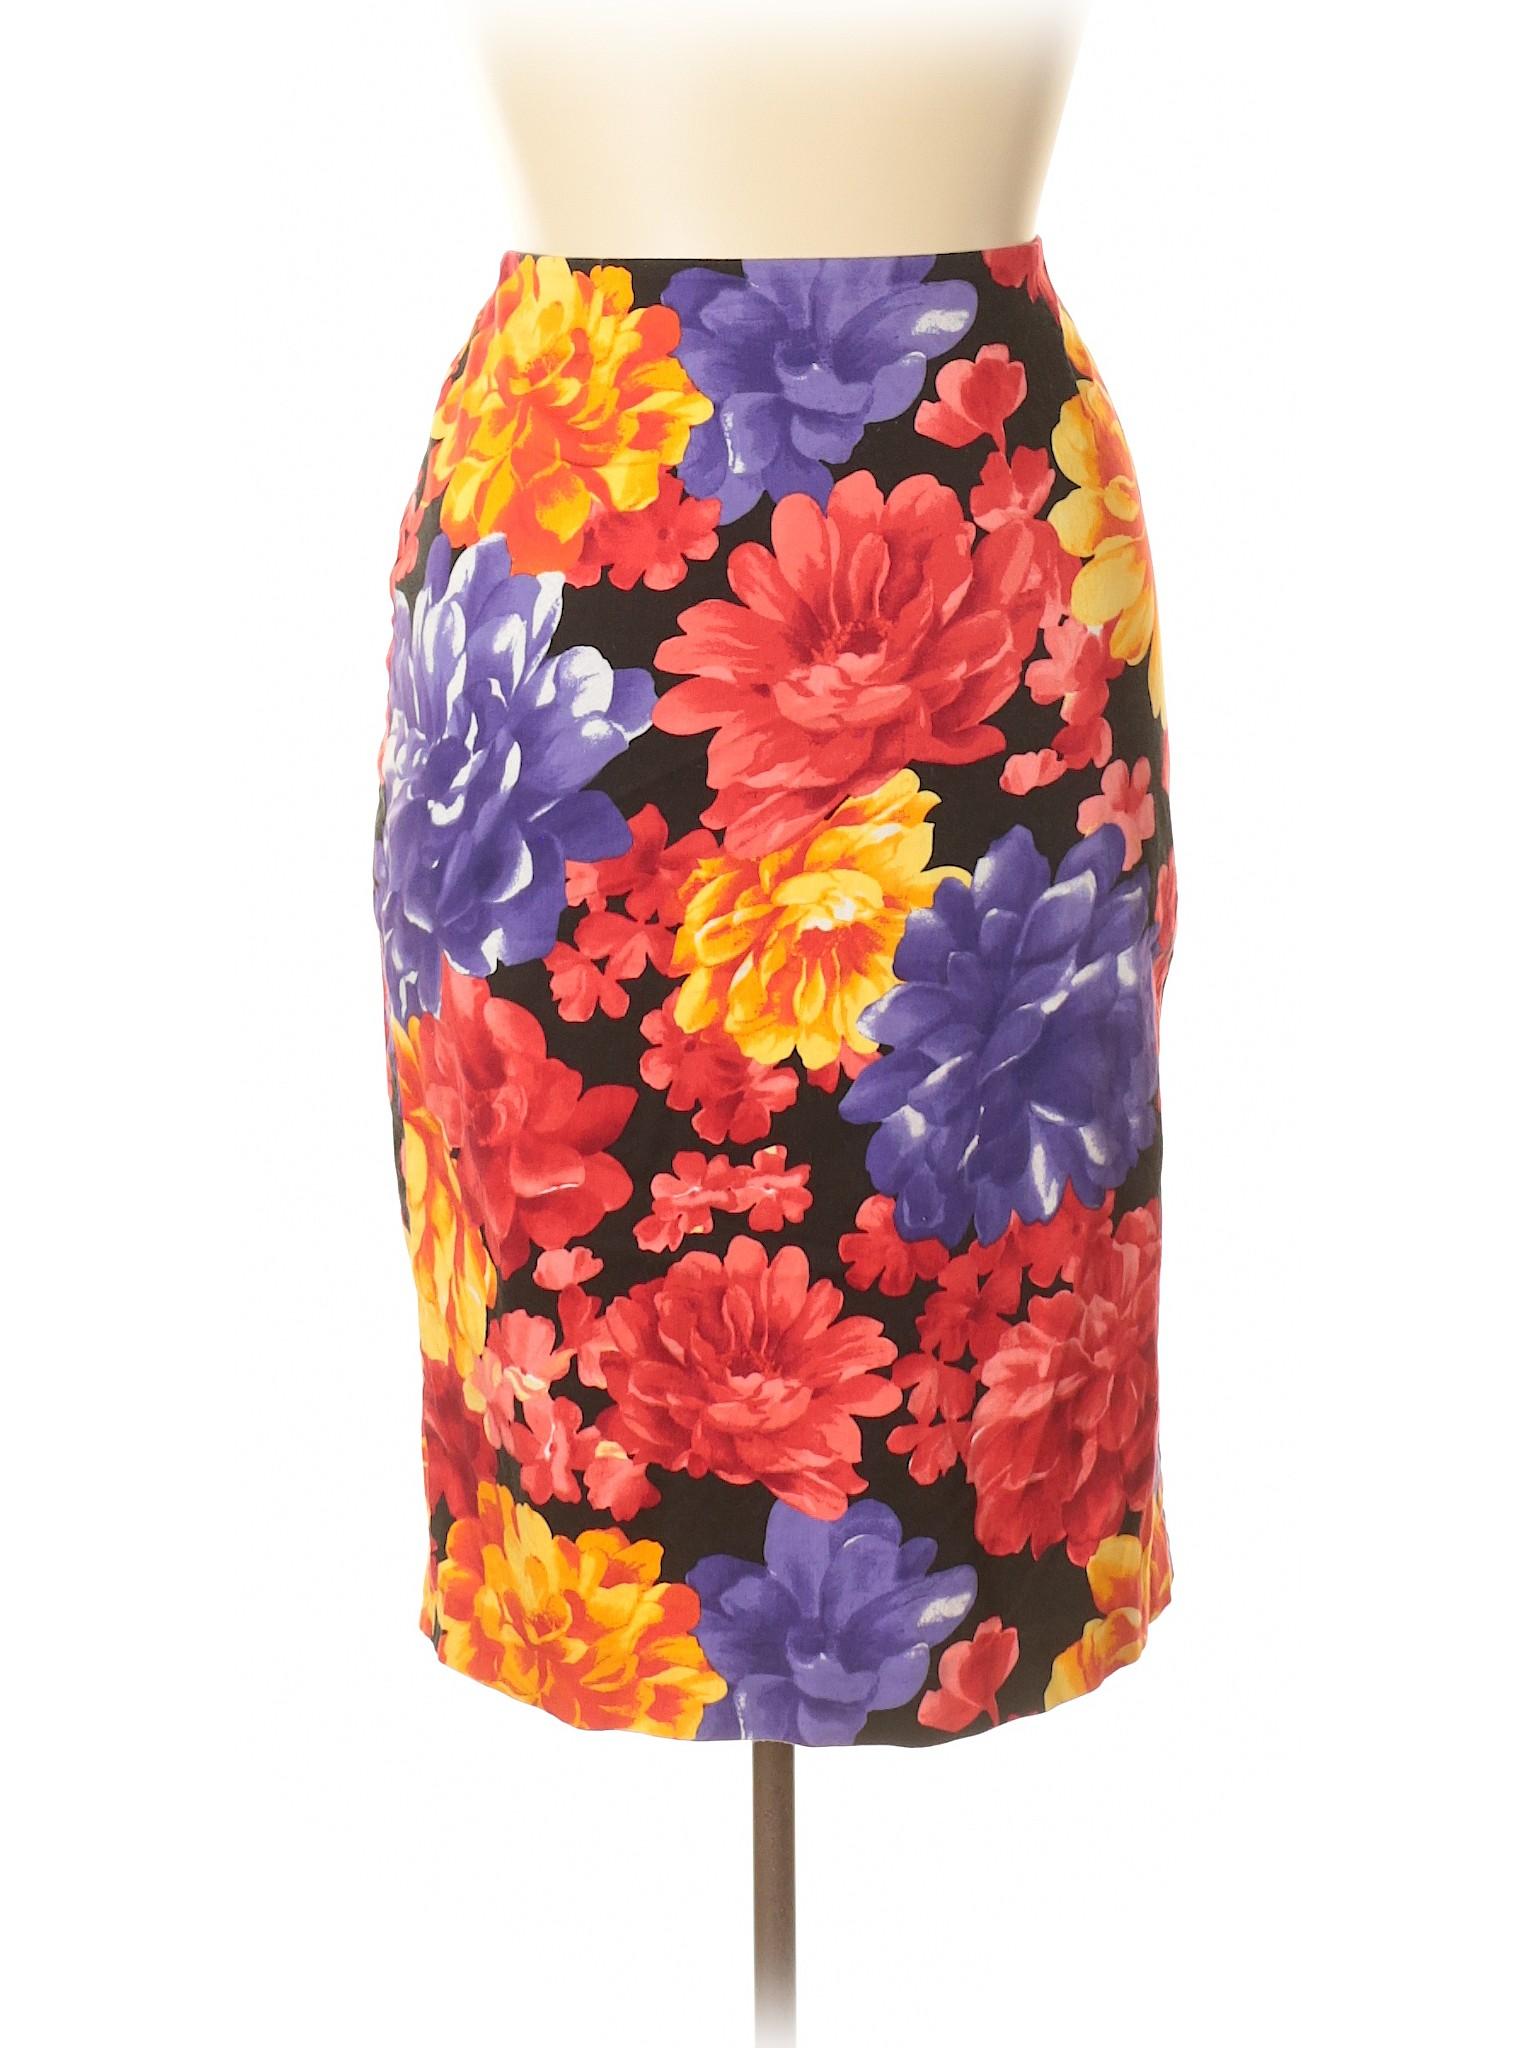 Casual Boutique Boutique Boutique Casual Boutique Casual Skirt Skirt Casual Skirt Skirt nfIqwd